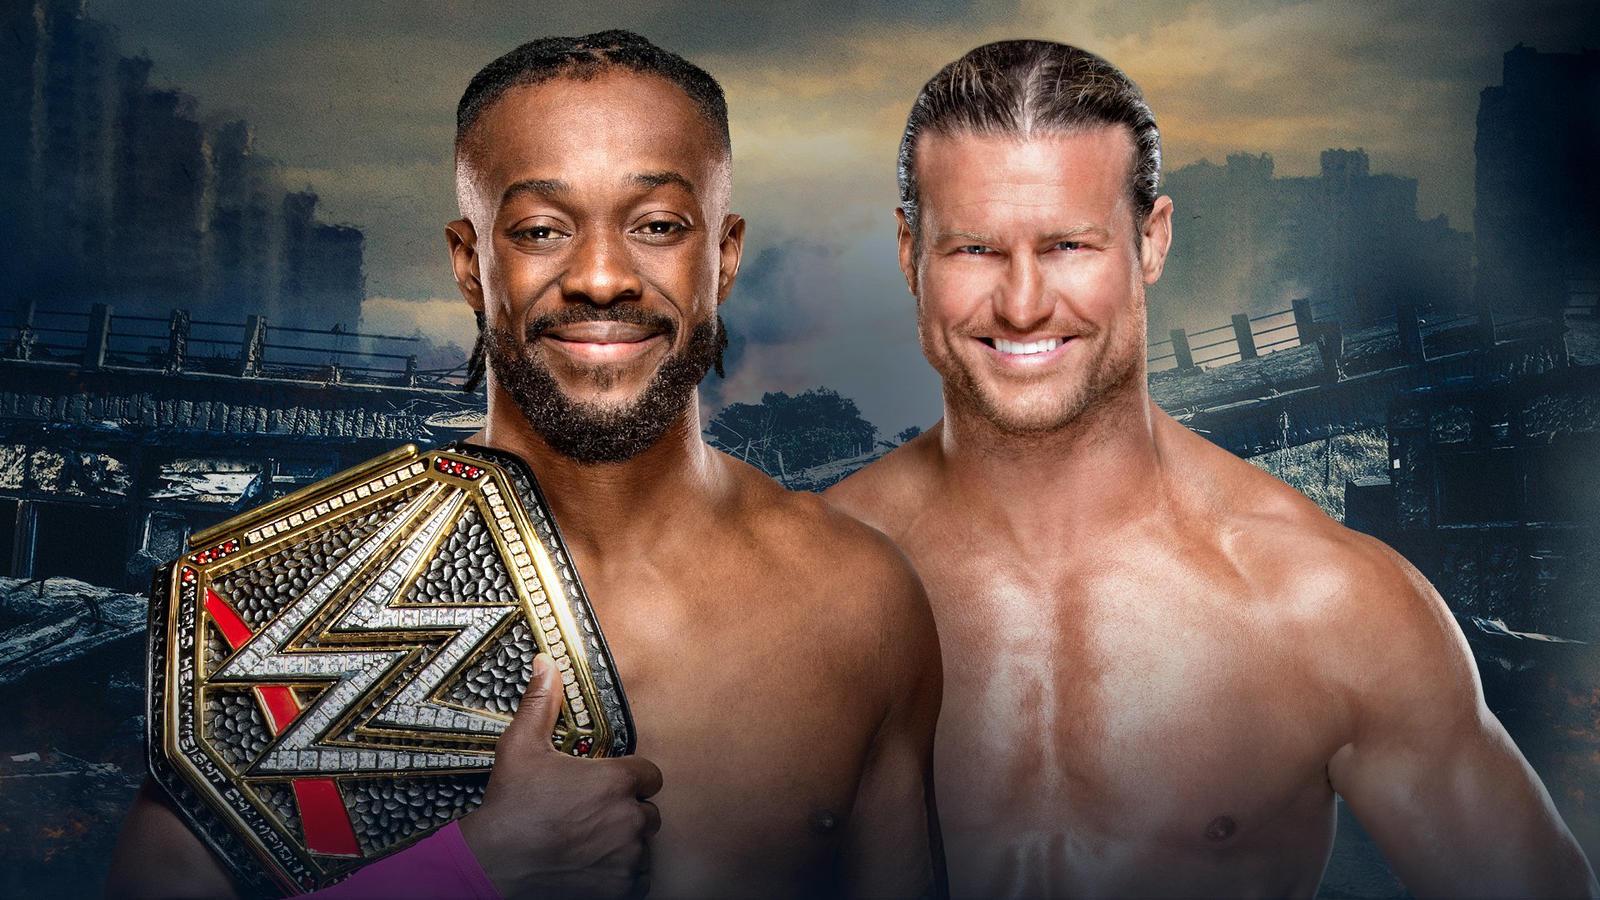 WWE Champion Kofi Kingston vs. Dolph Ziggler (Steel Cage Match)